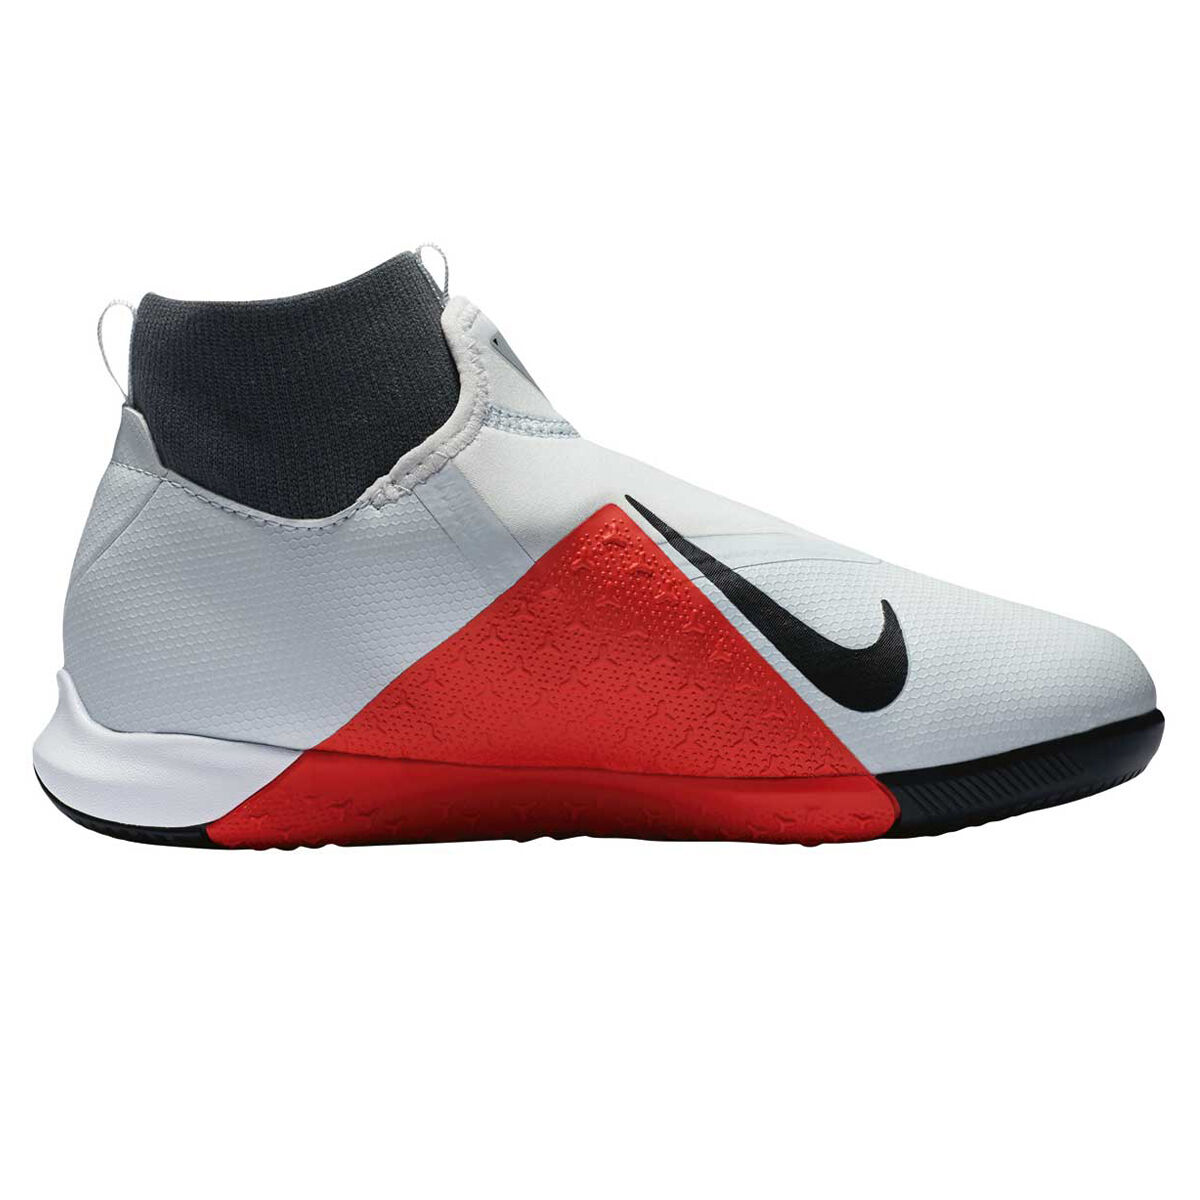 Nike Phantom Vision Academy Junior